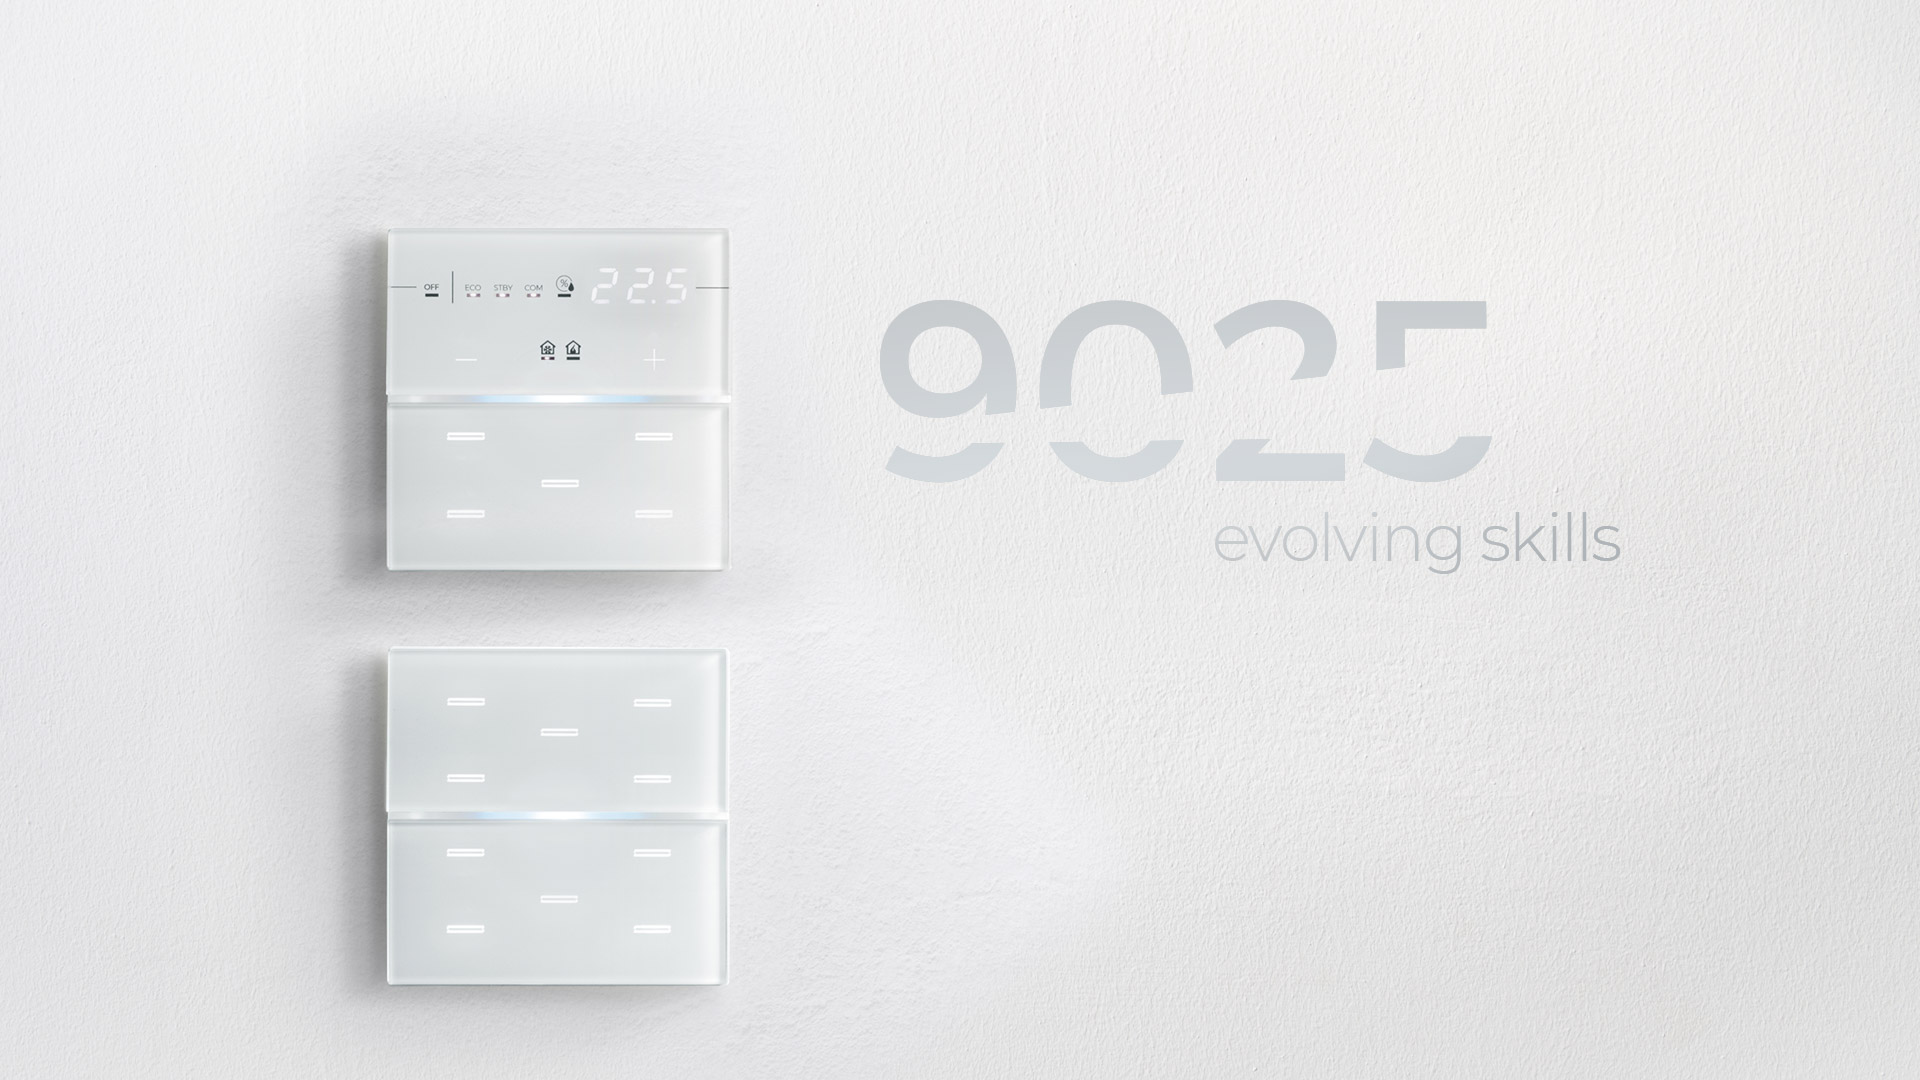 slide-homepage-9025-rev2